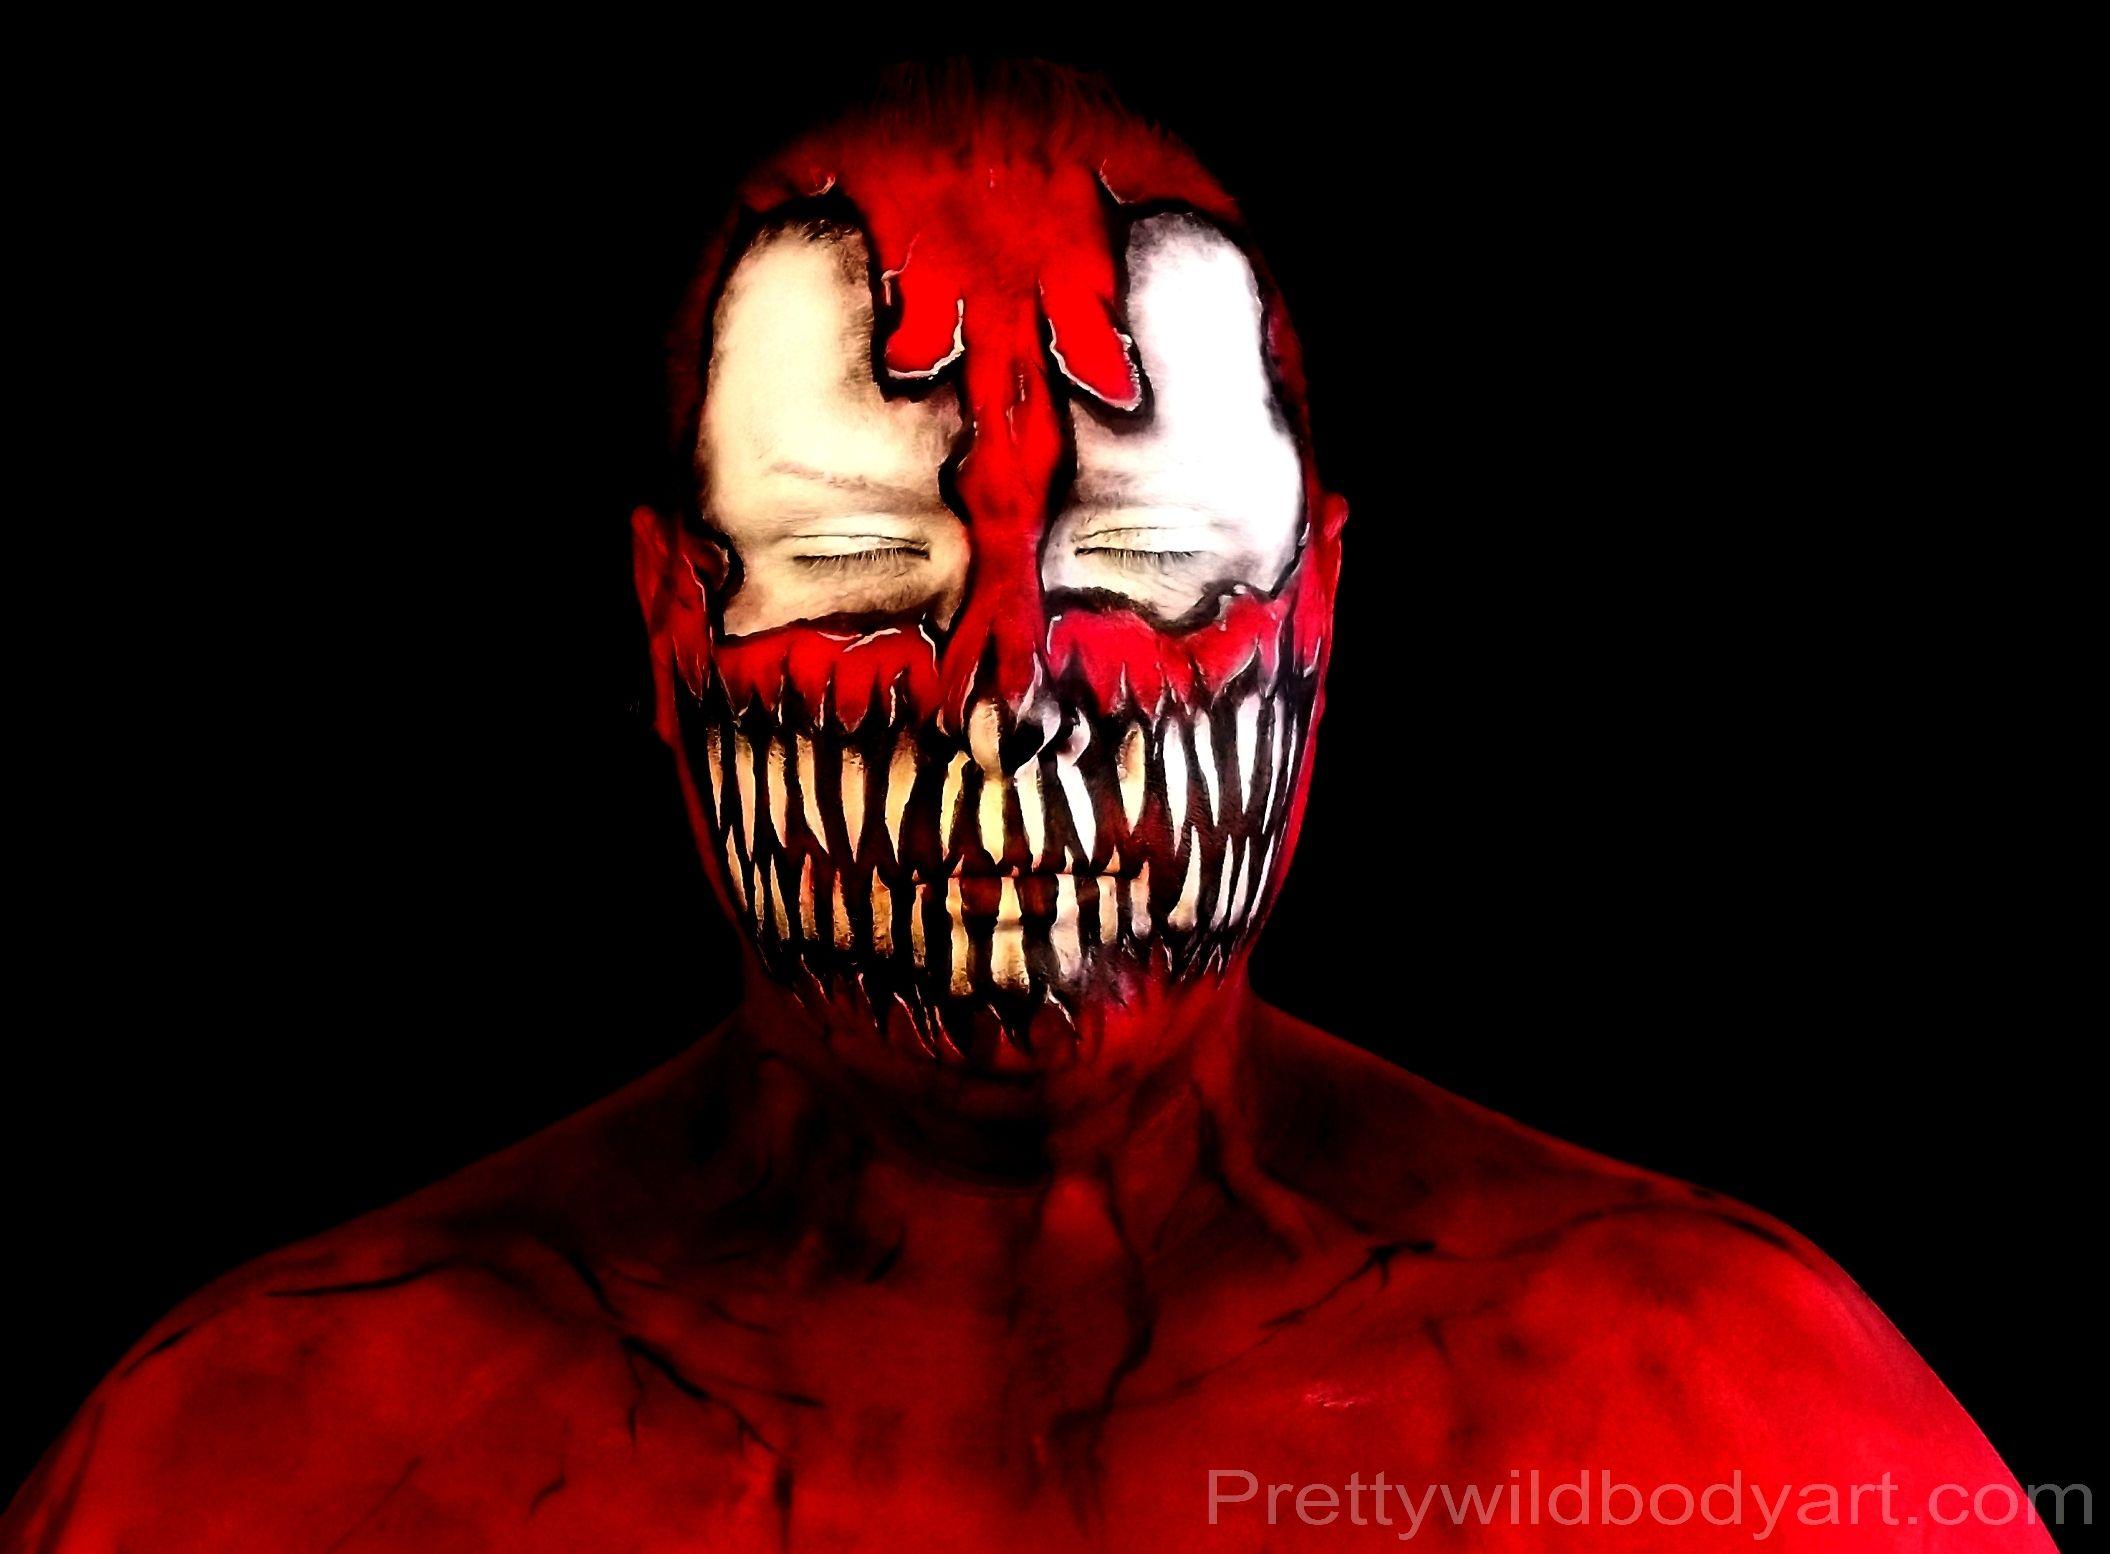 Pin by Melody Watts on Carnage & venom | Pinterest | More Venom ideas